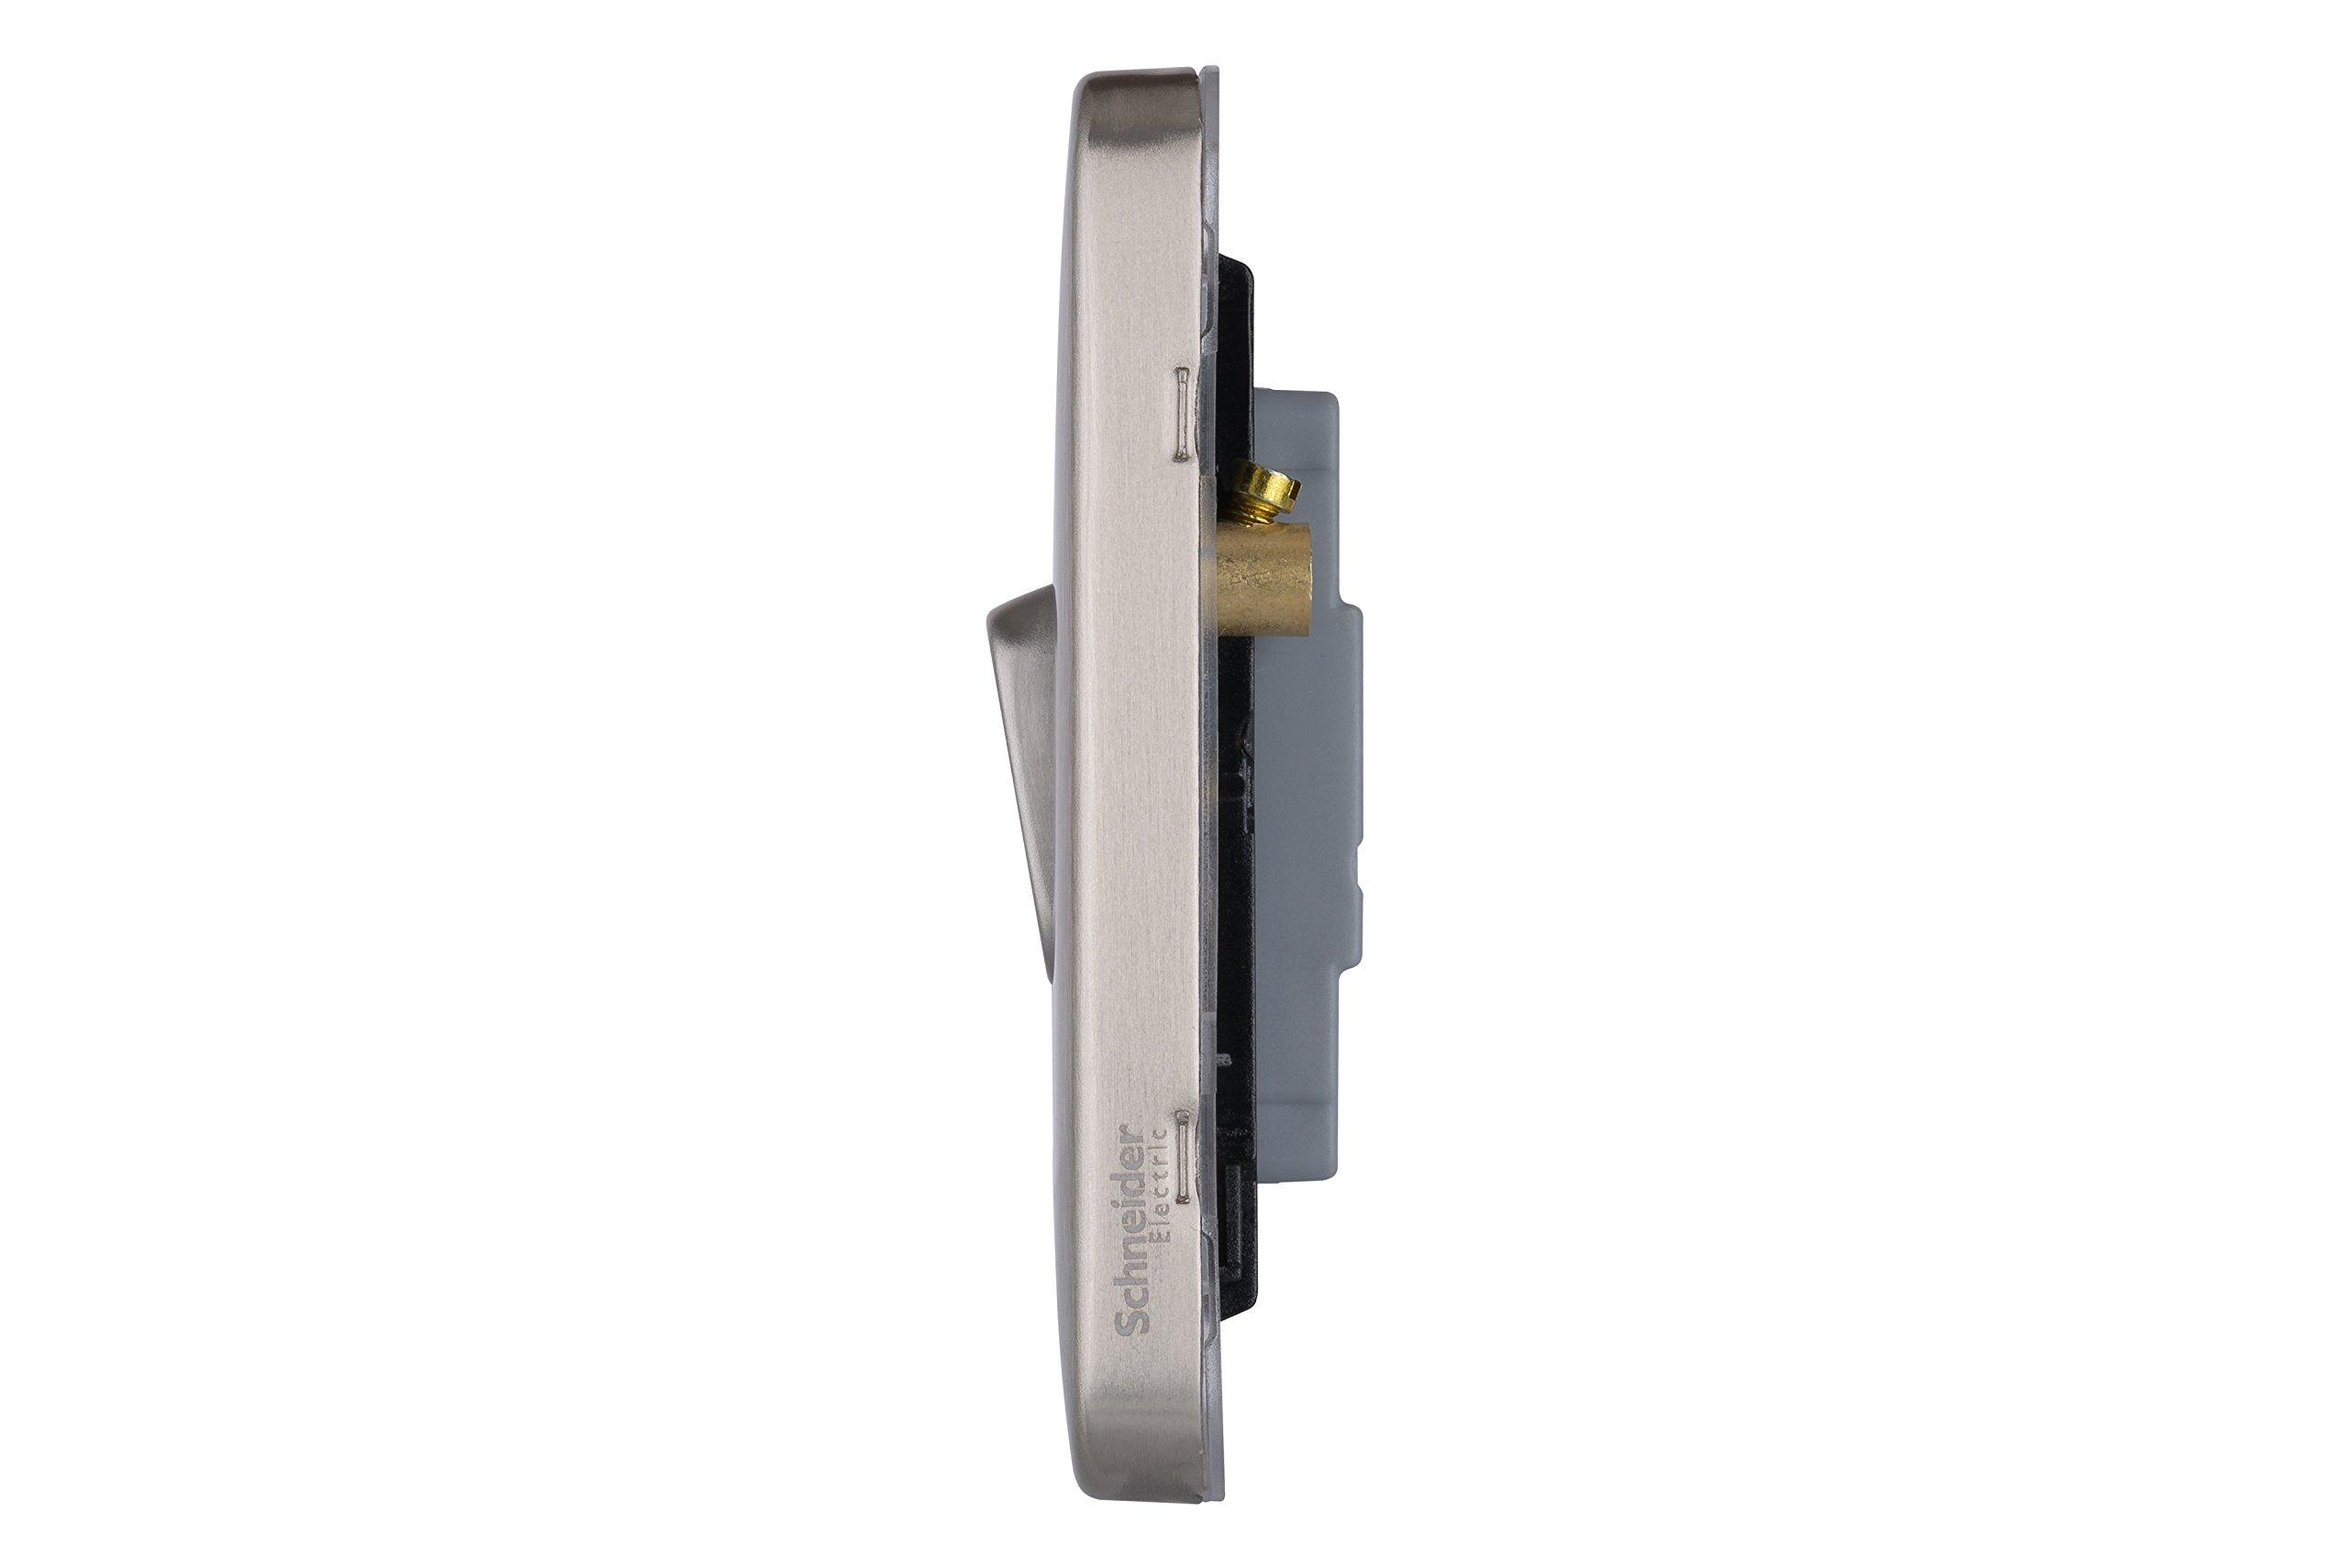 Schneider Electric GGBL1022BSBS Lisse 2 W lat/ón Satinado 10 AX 2G BSB 240 V Interruptor sin Tornillos